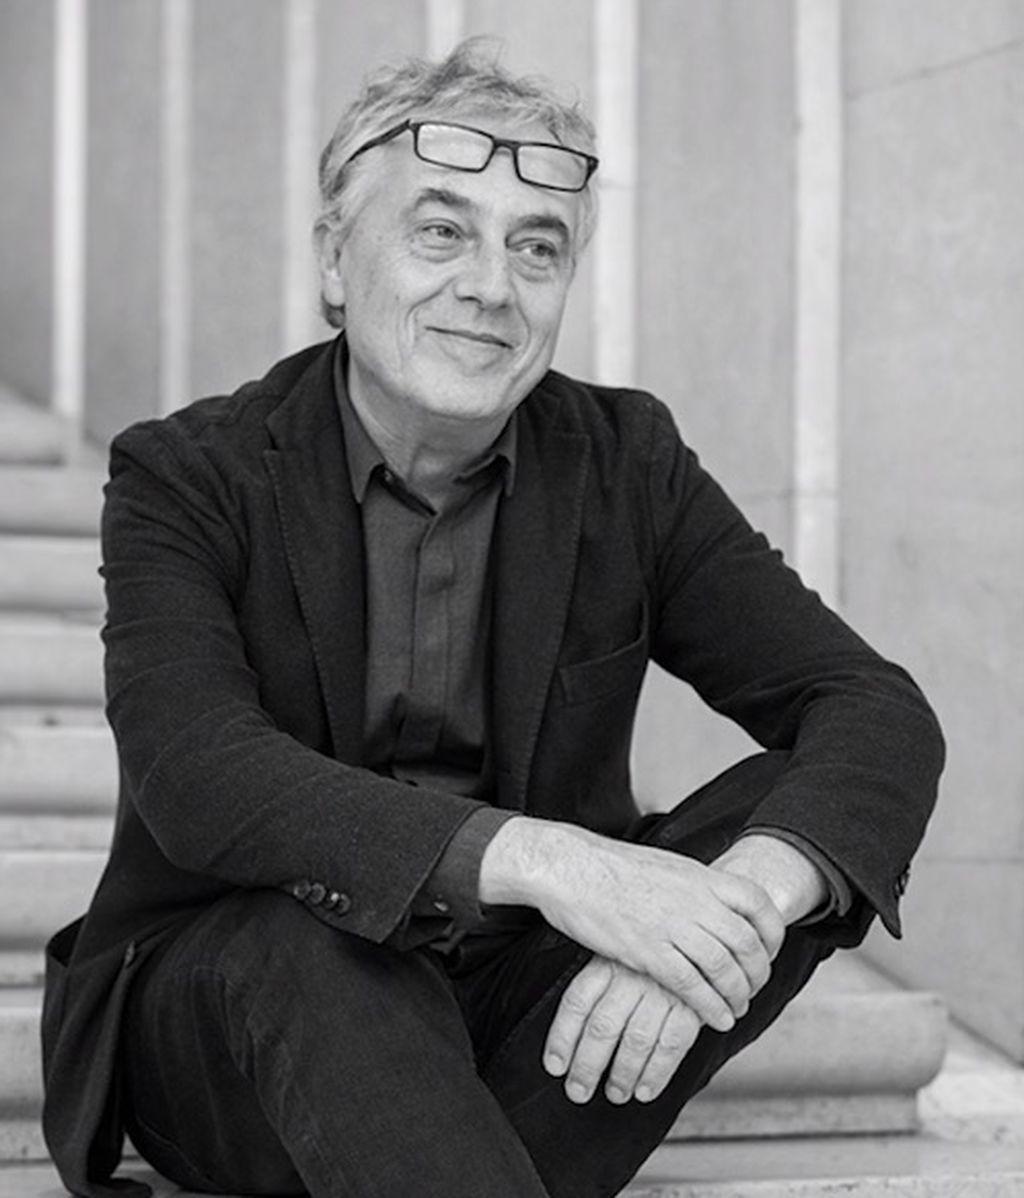 Stefano Boeri